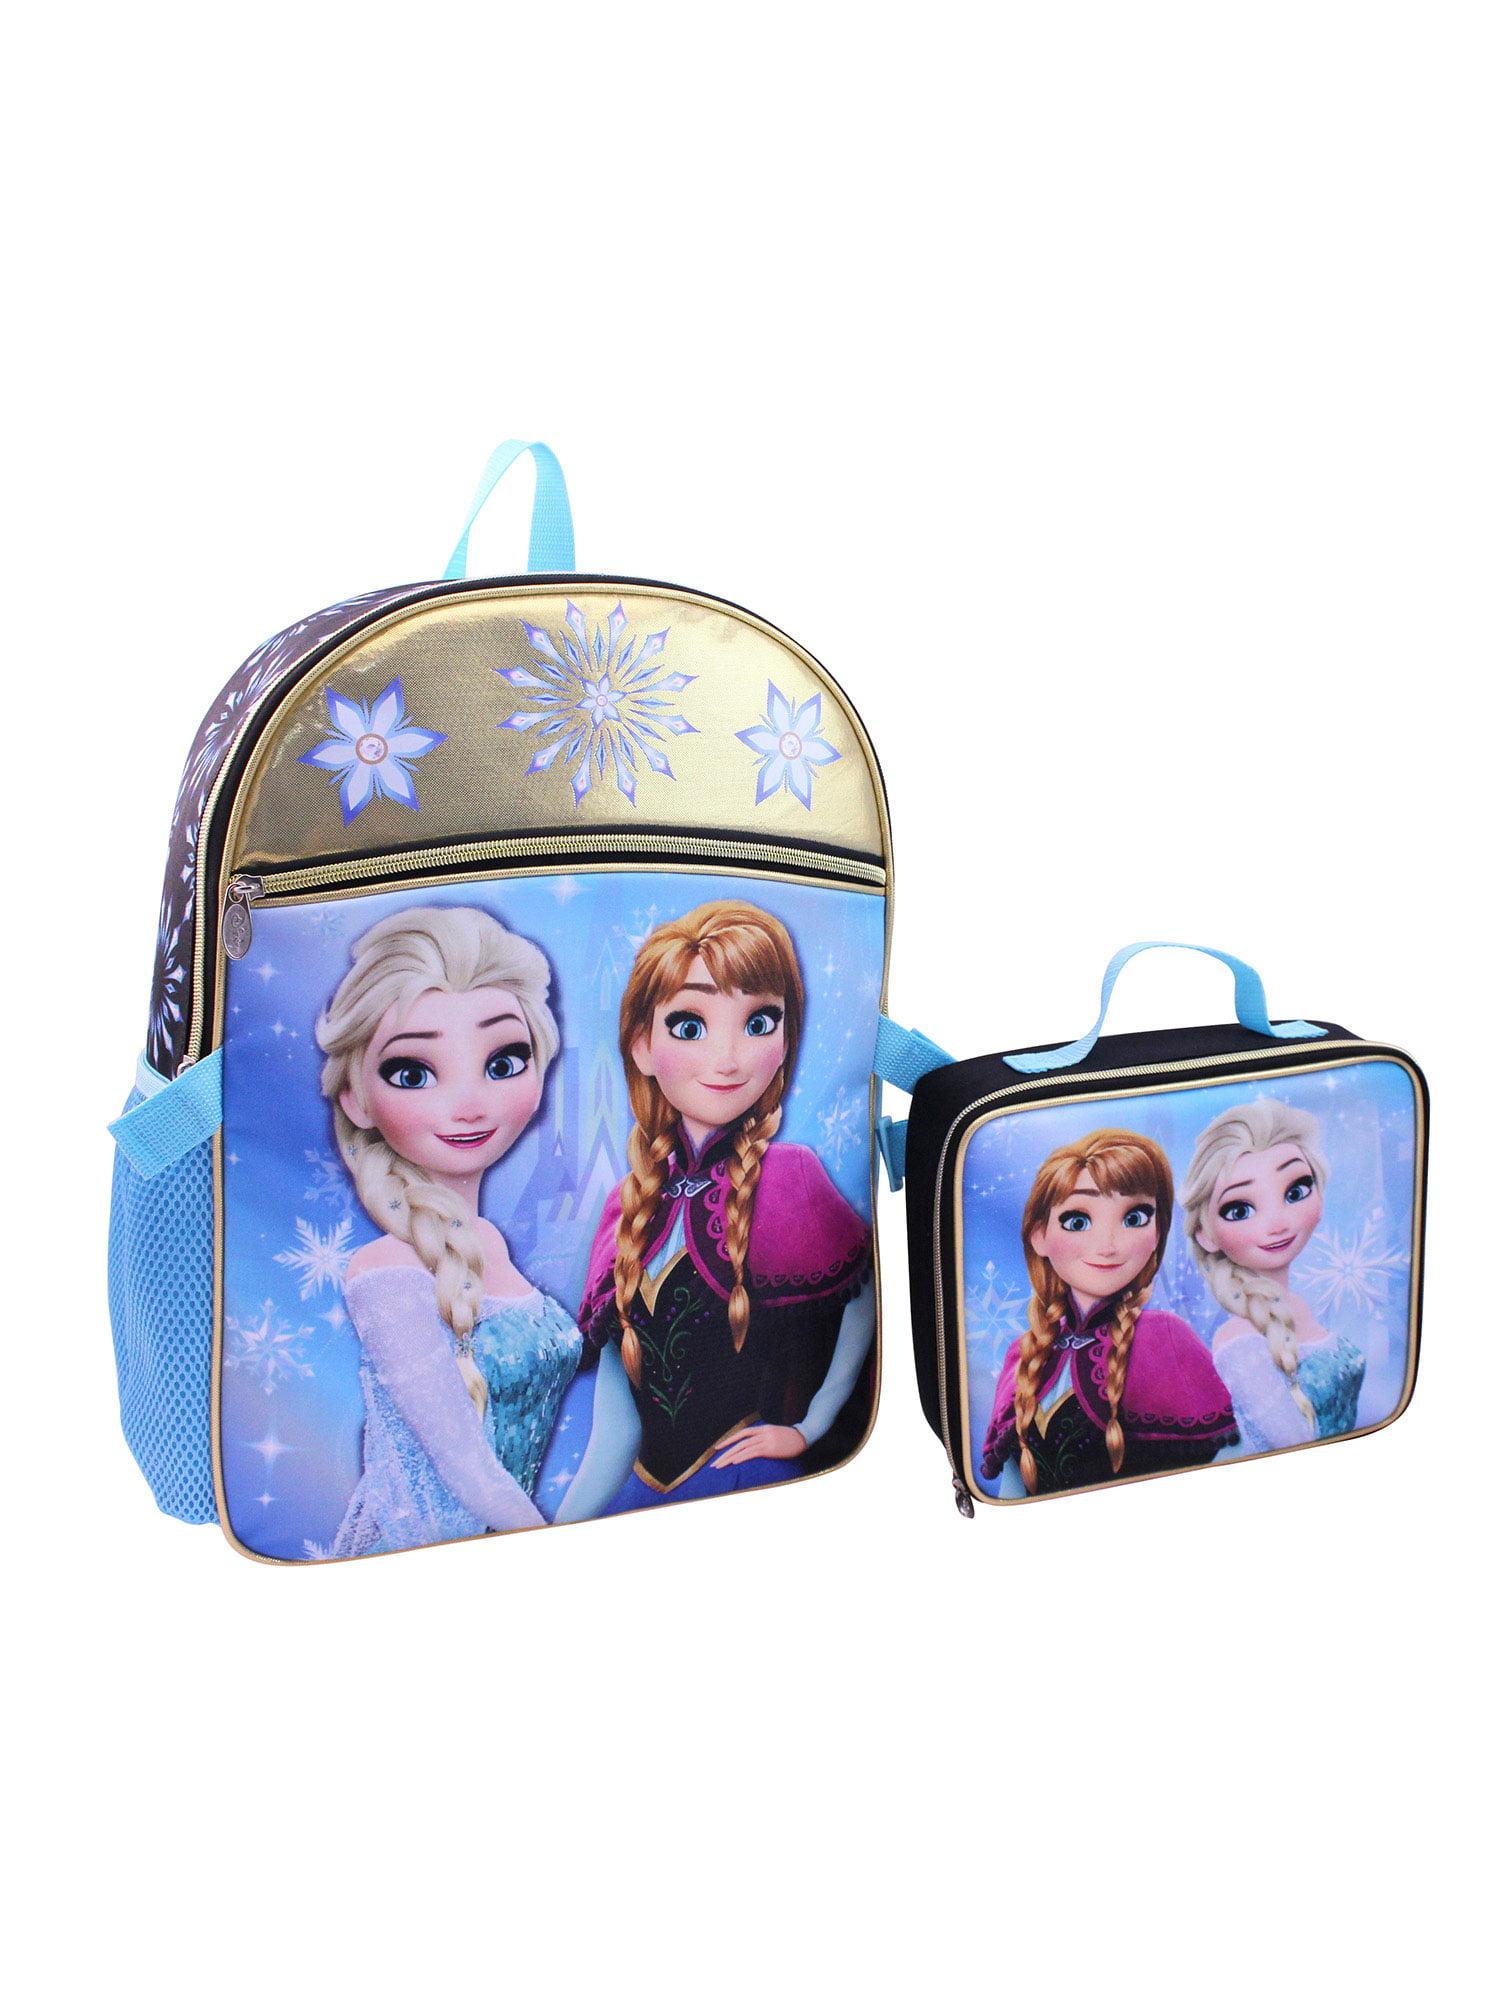 Disney Frozen Frozen Backpack With Lunch